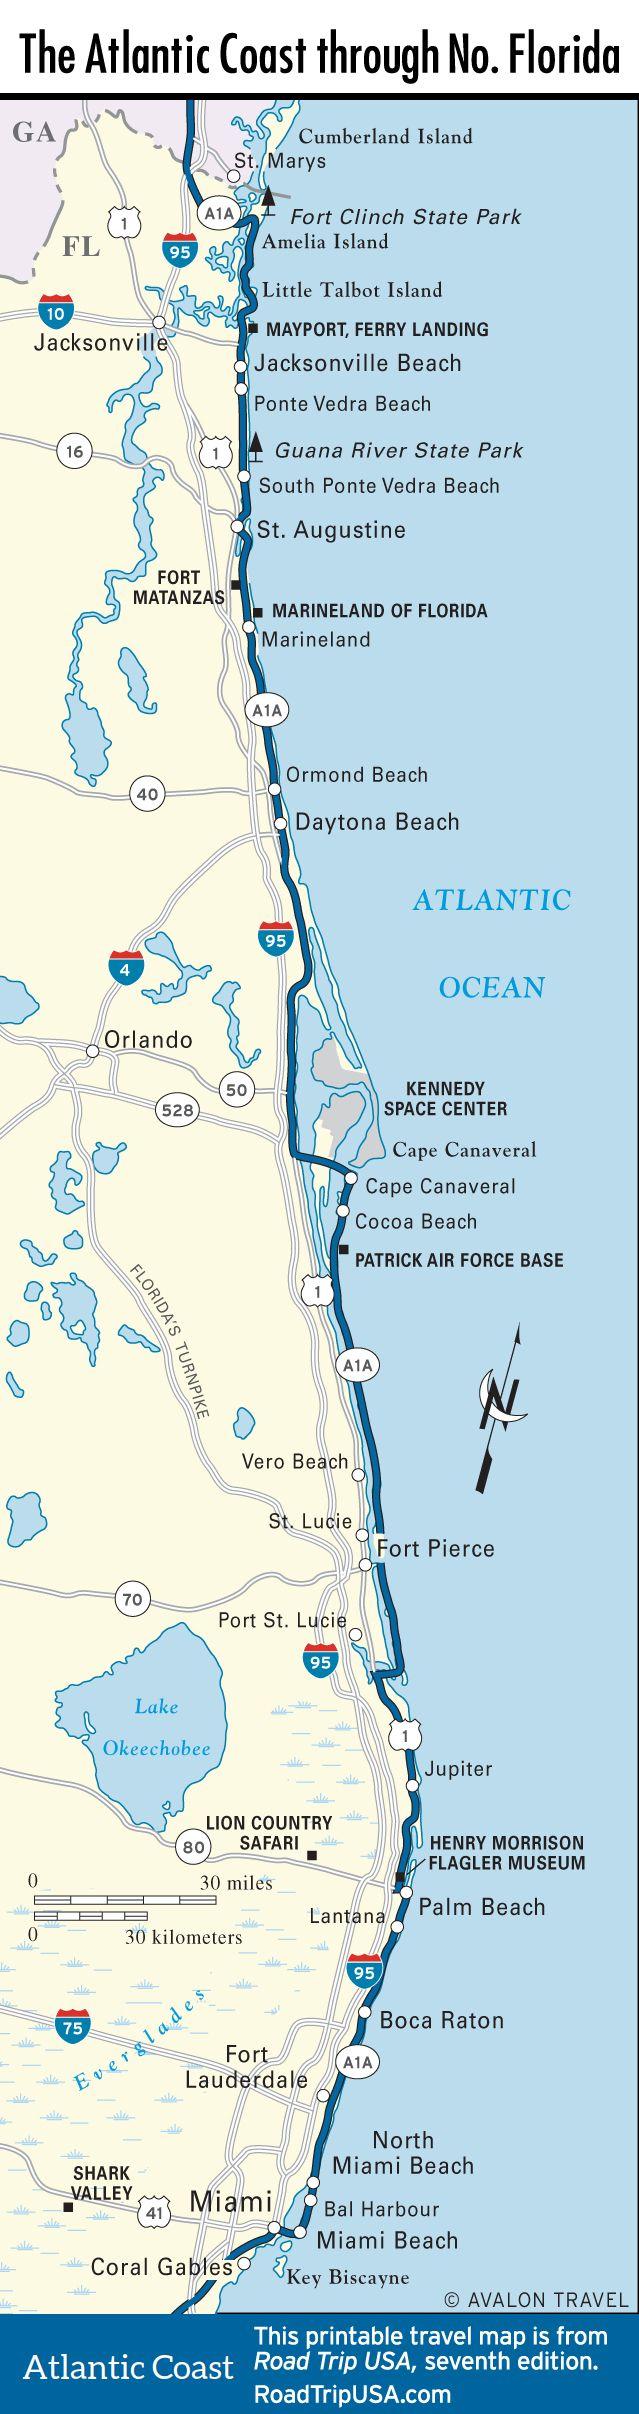 Map Of The Atlantic Coast Through Northern Florida. | Florida A1A - I Want A Map Of Florida